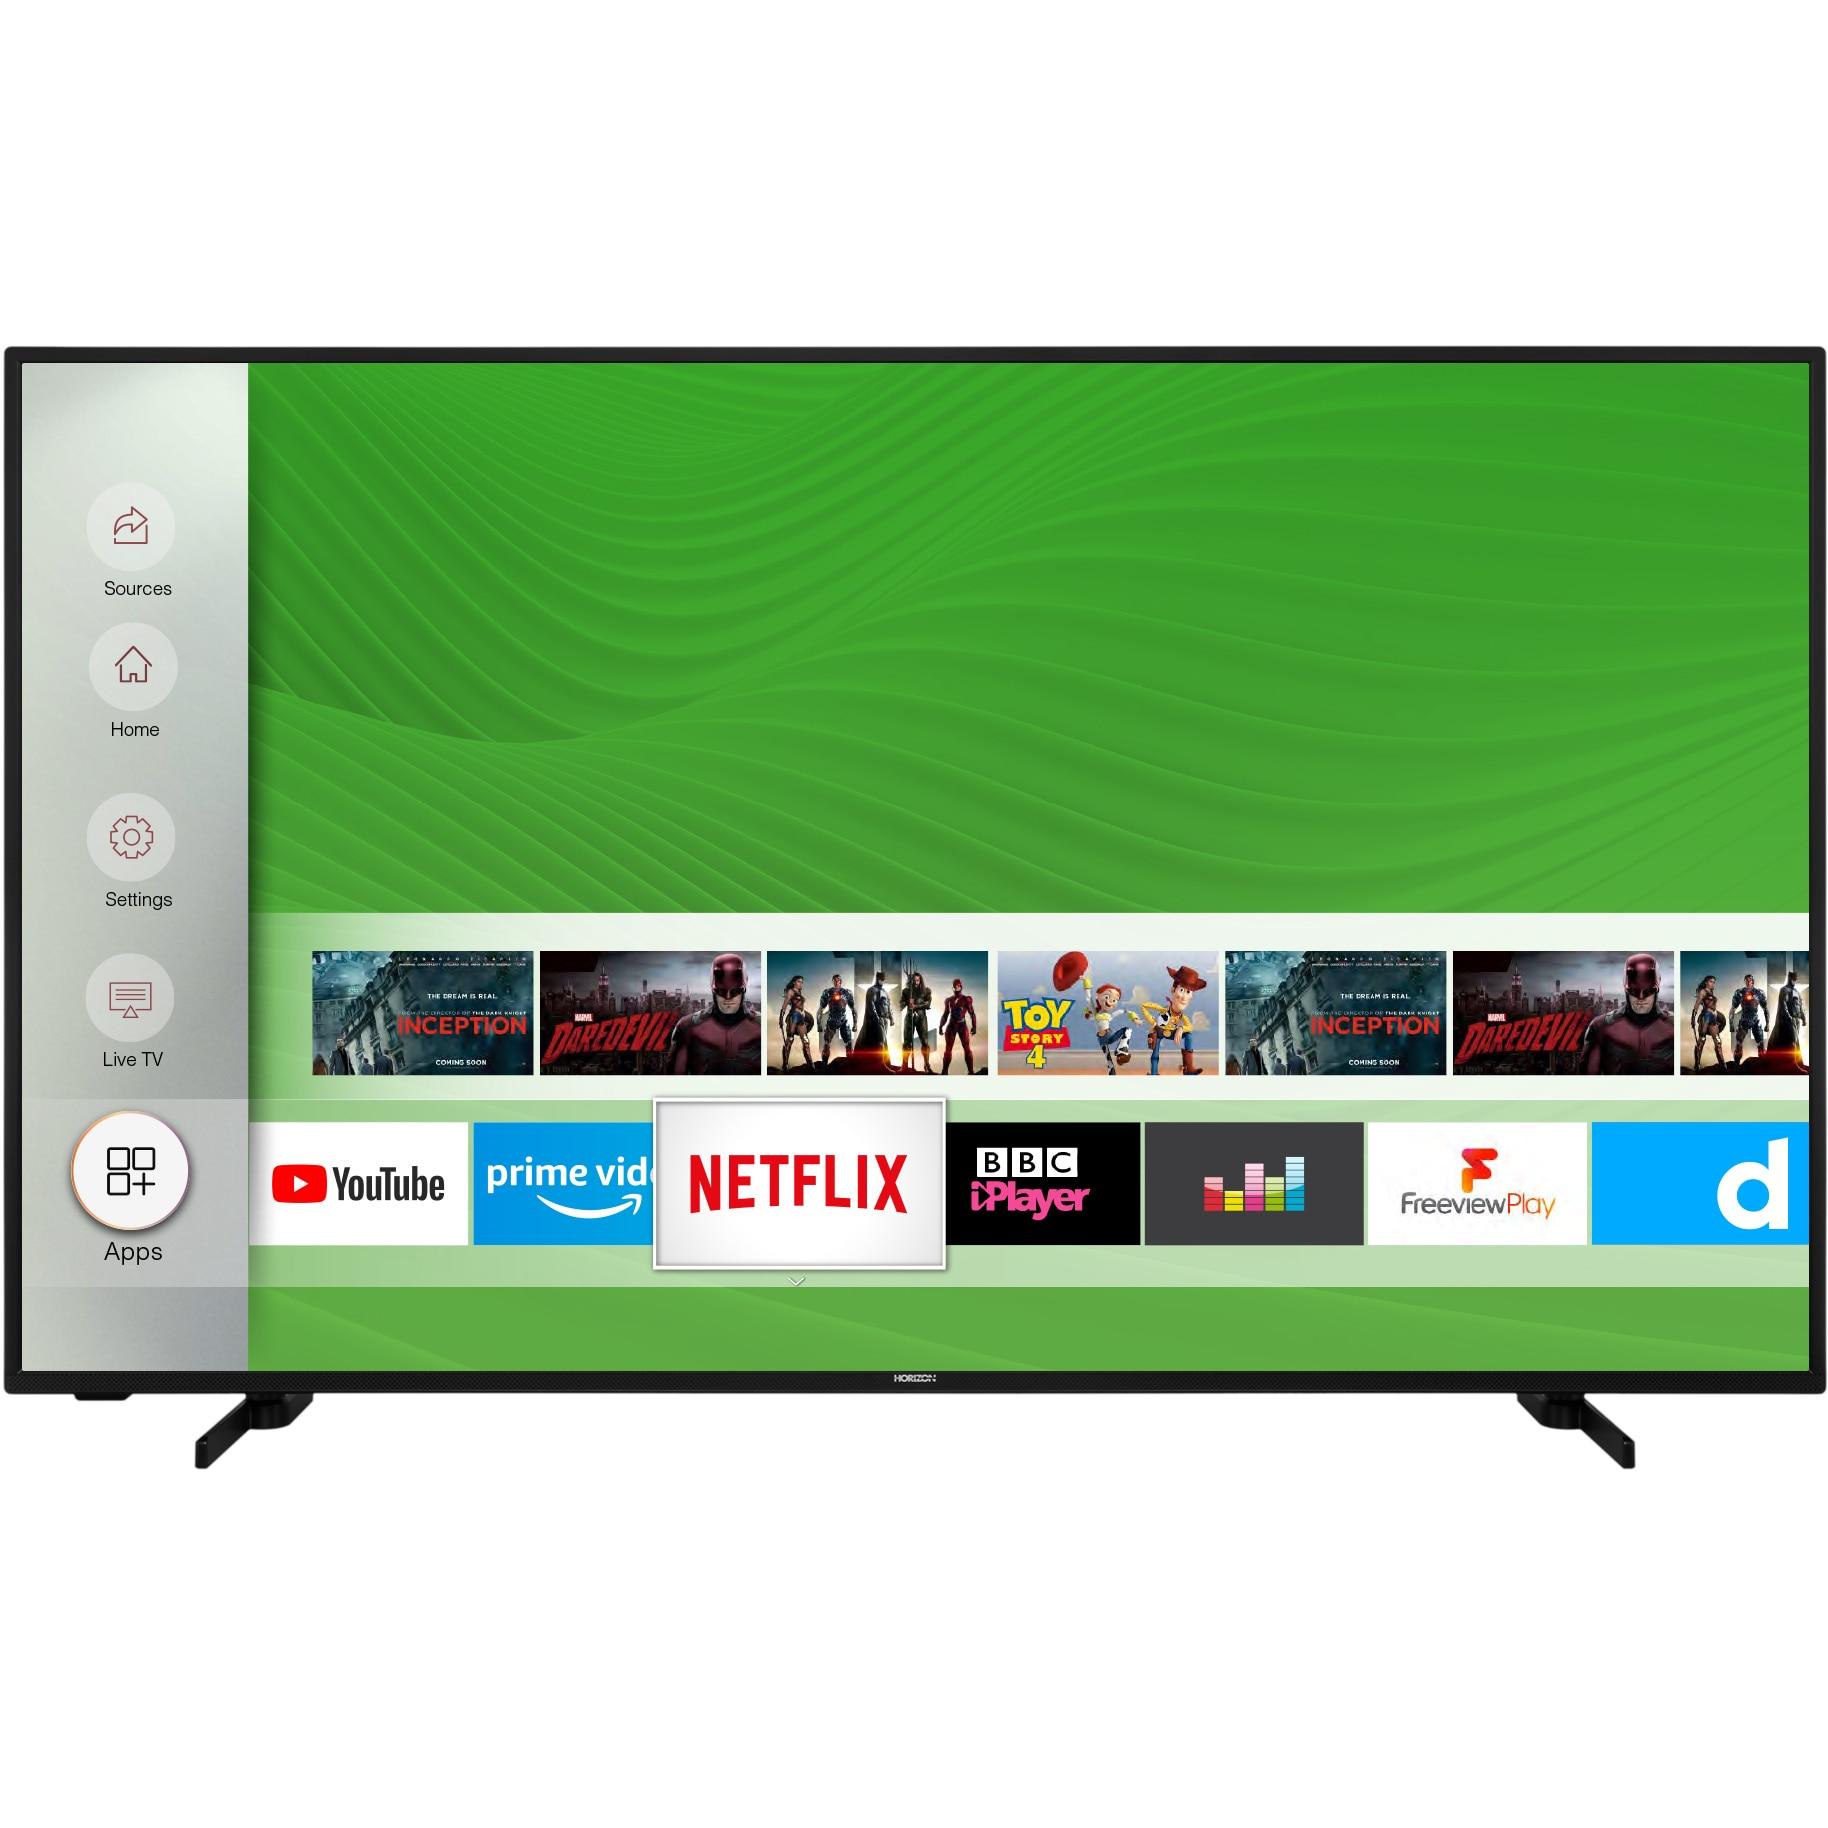 Fotografie Televizor Horizon 55HL7530U, 139 cm, Smart, 4K Ultra HD, LED, Clasa A+